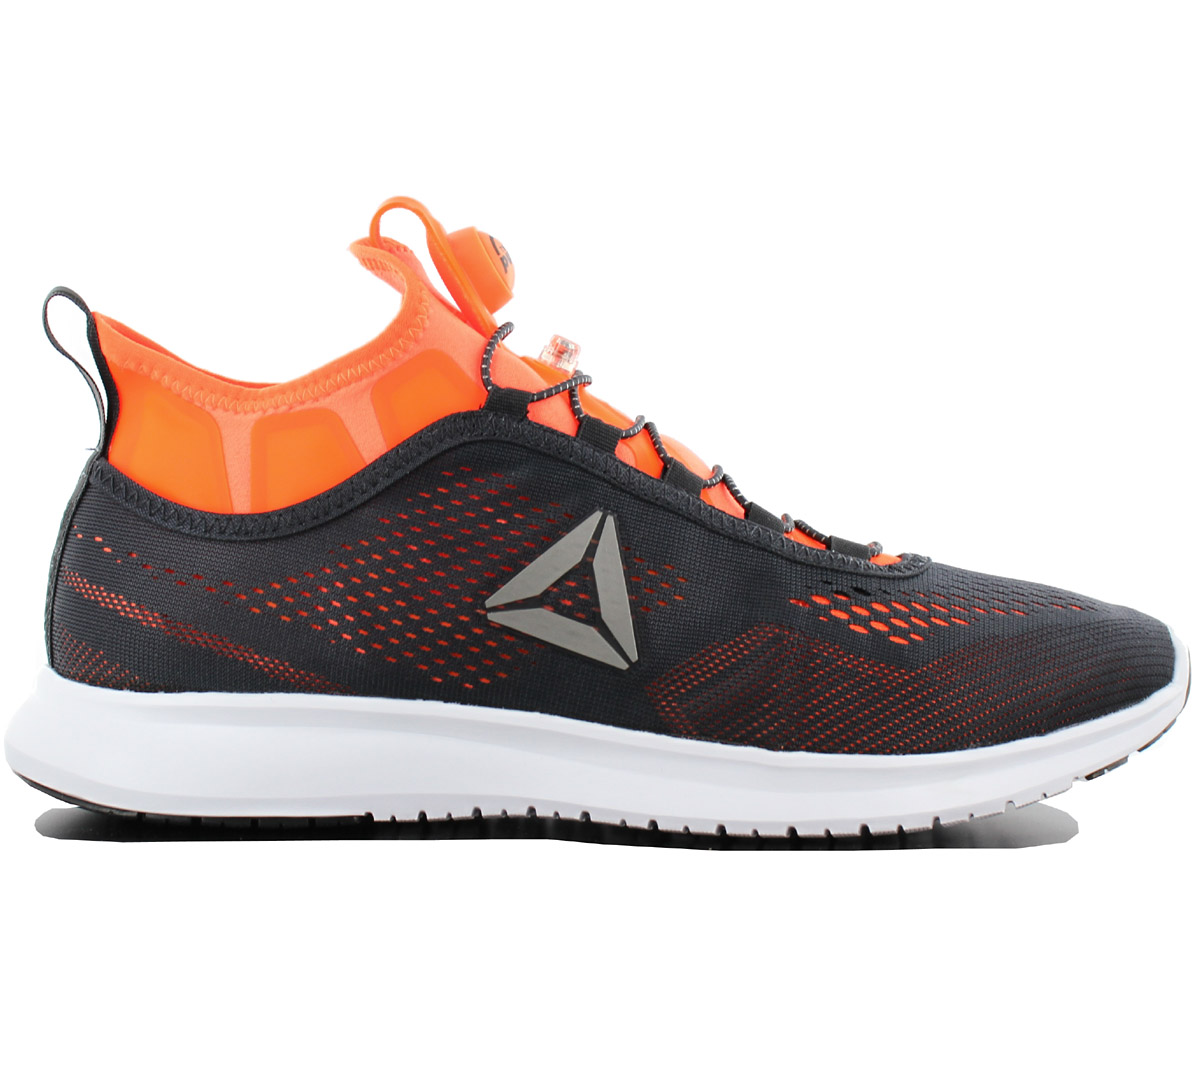 7d2088b2d56c22 Reebok the Pump plus Tech Men s Shoes Sneakers Running Shoes Running ...